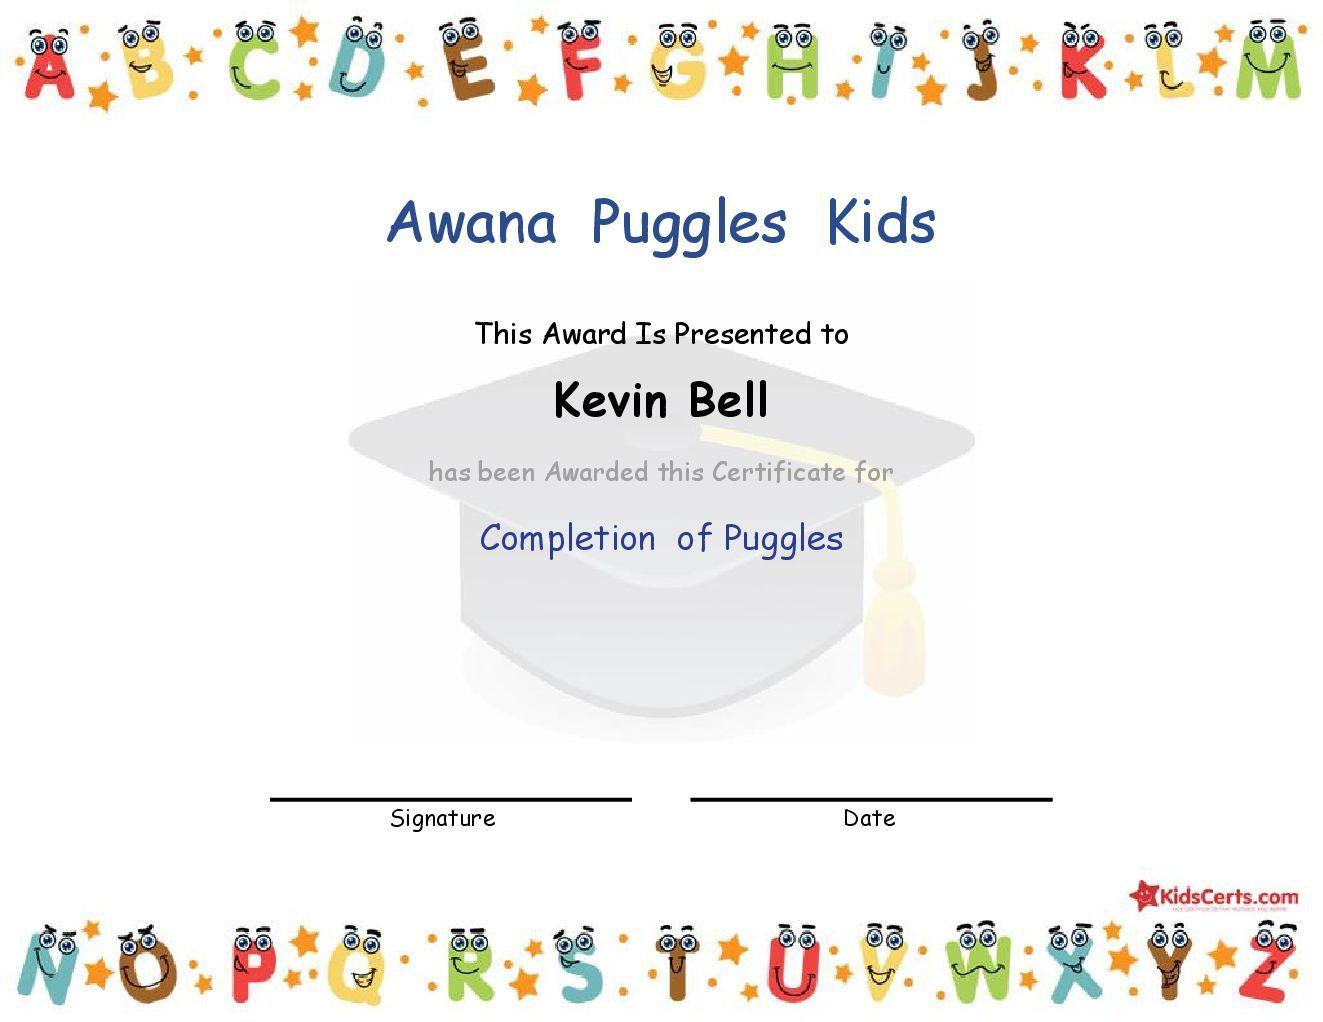 Awana Puggles Kids